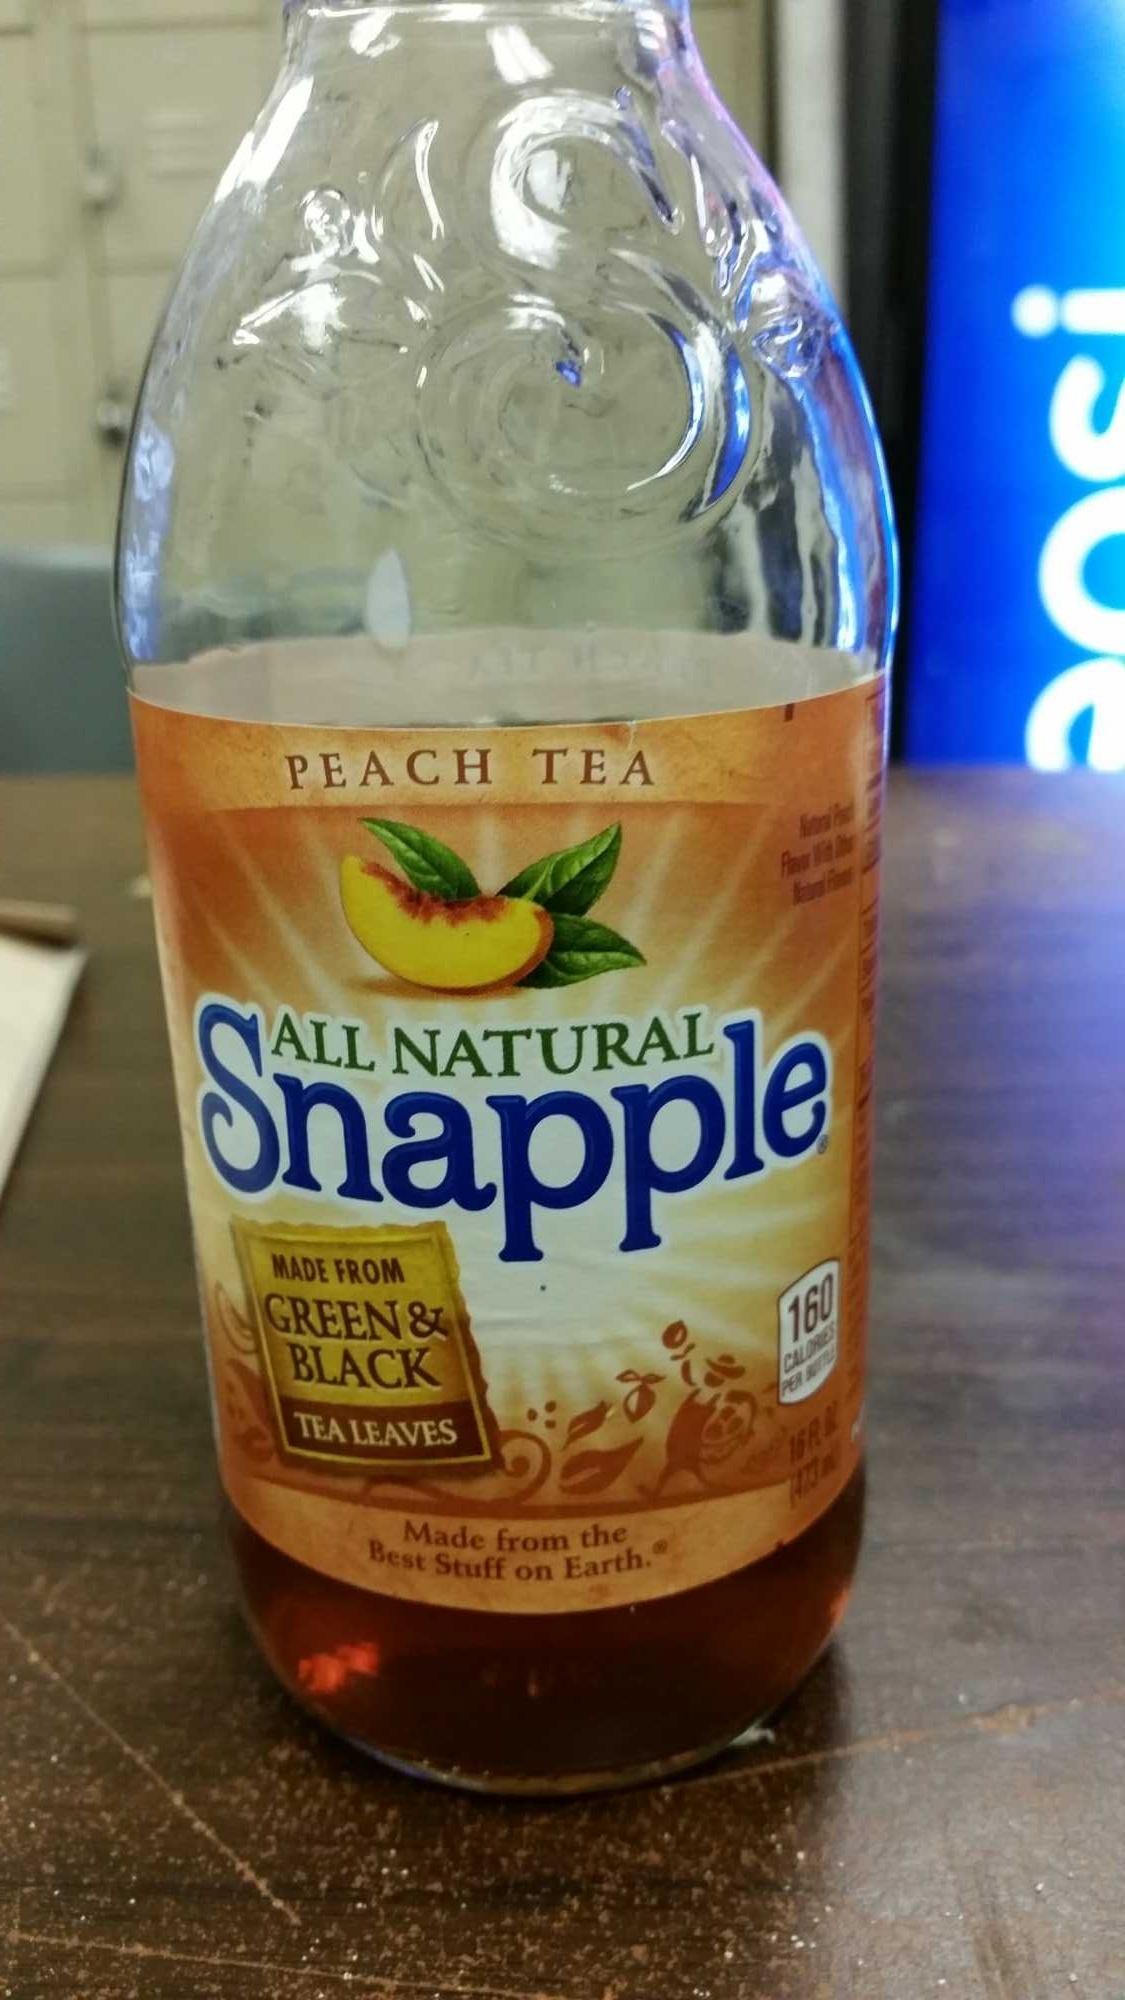 Snapple: Peach Tea - Product